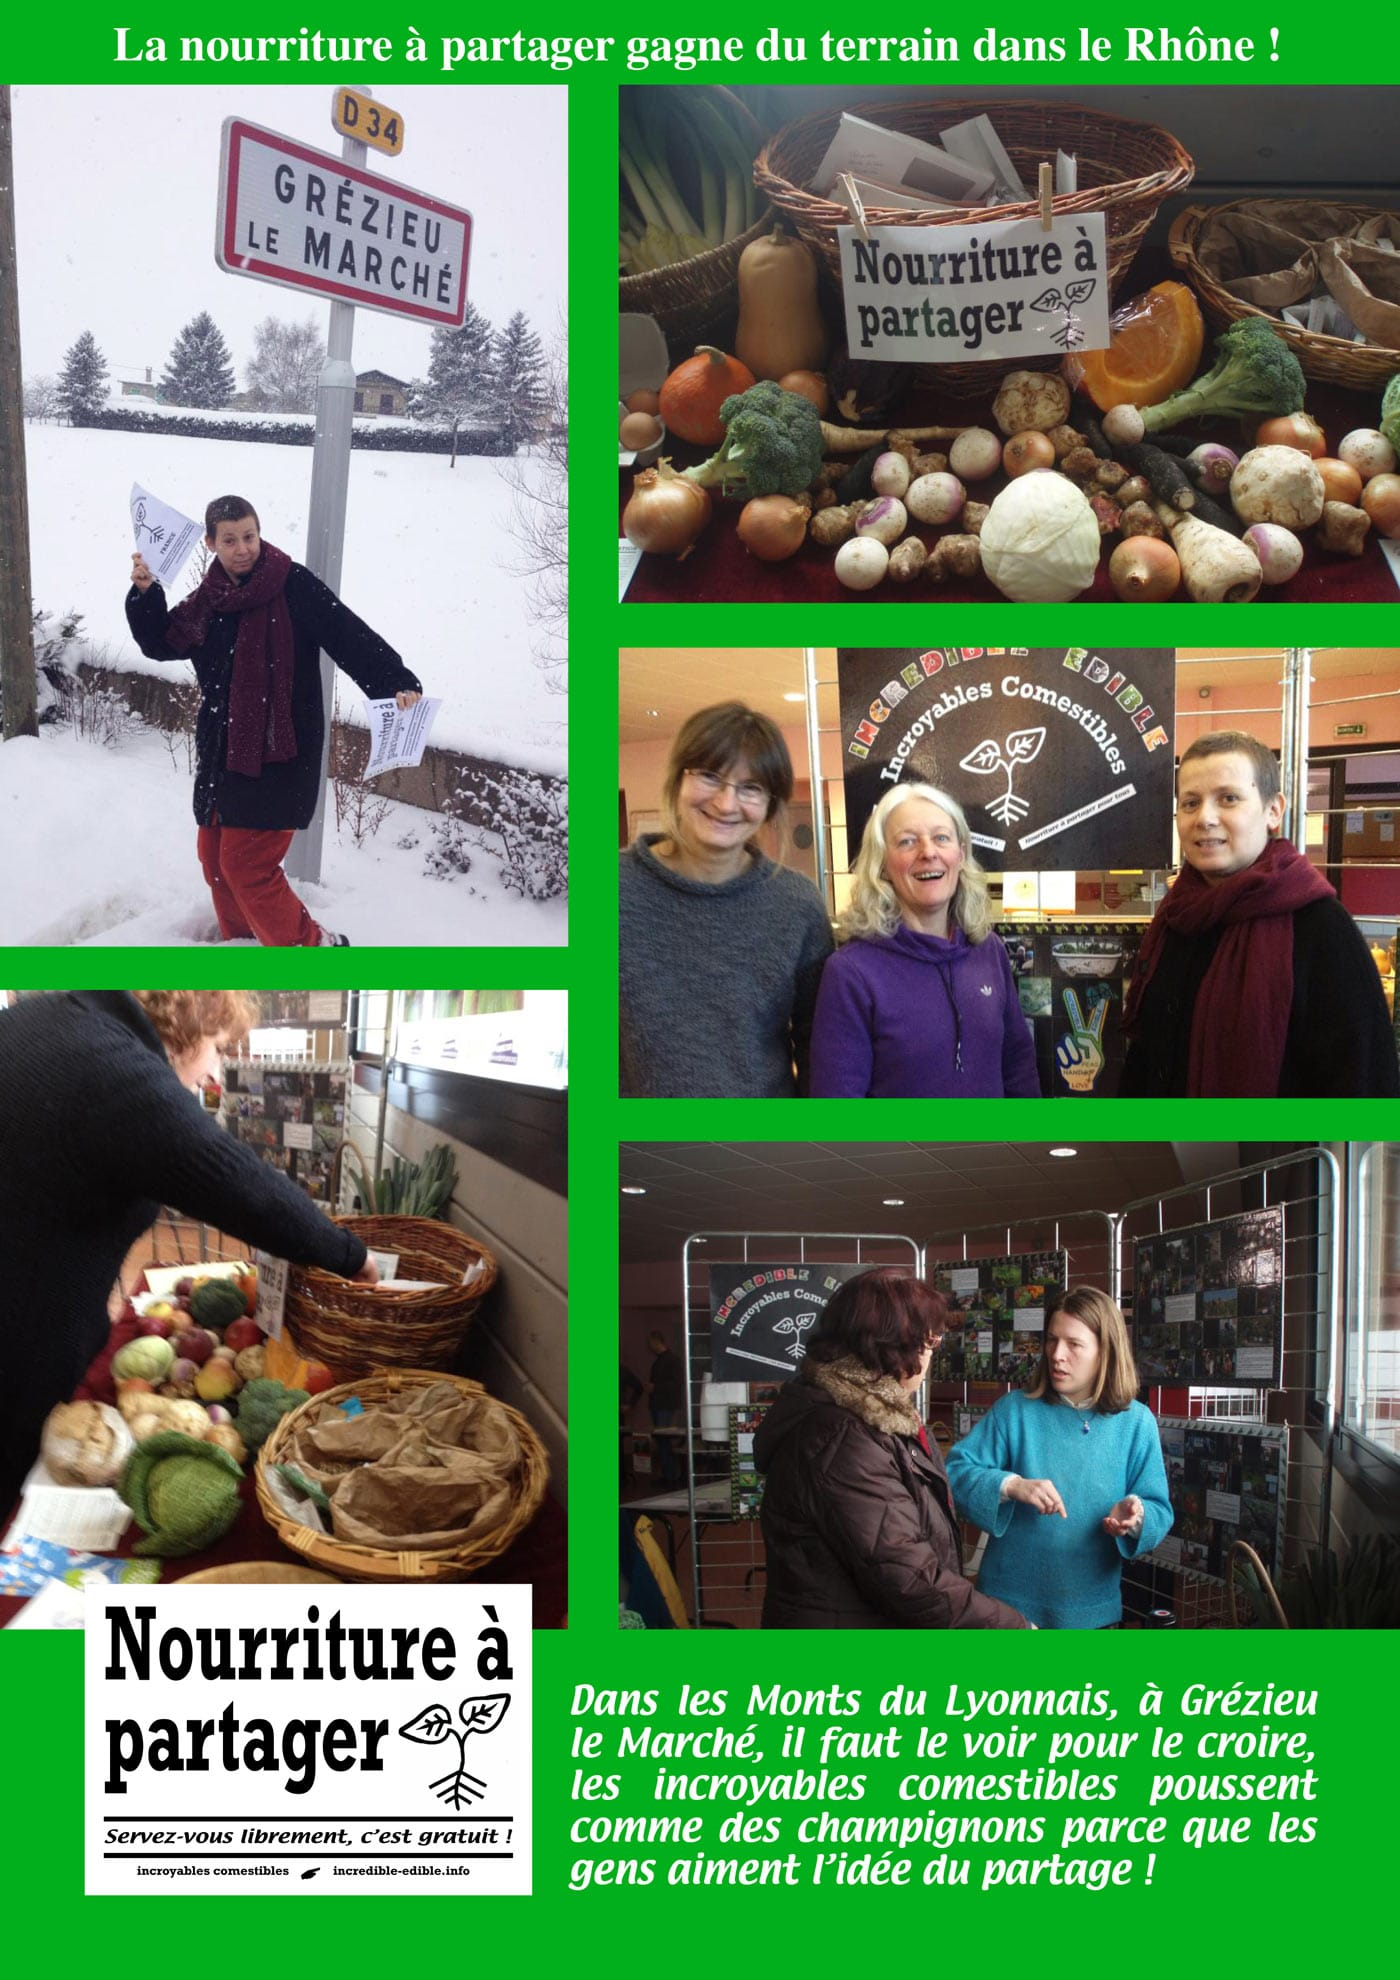 c392_incredible_edible_todmorden_france_rhone_grezieu-le-marche_incroyables_comestibles_w1400